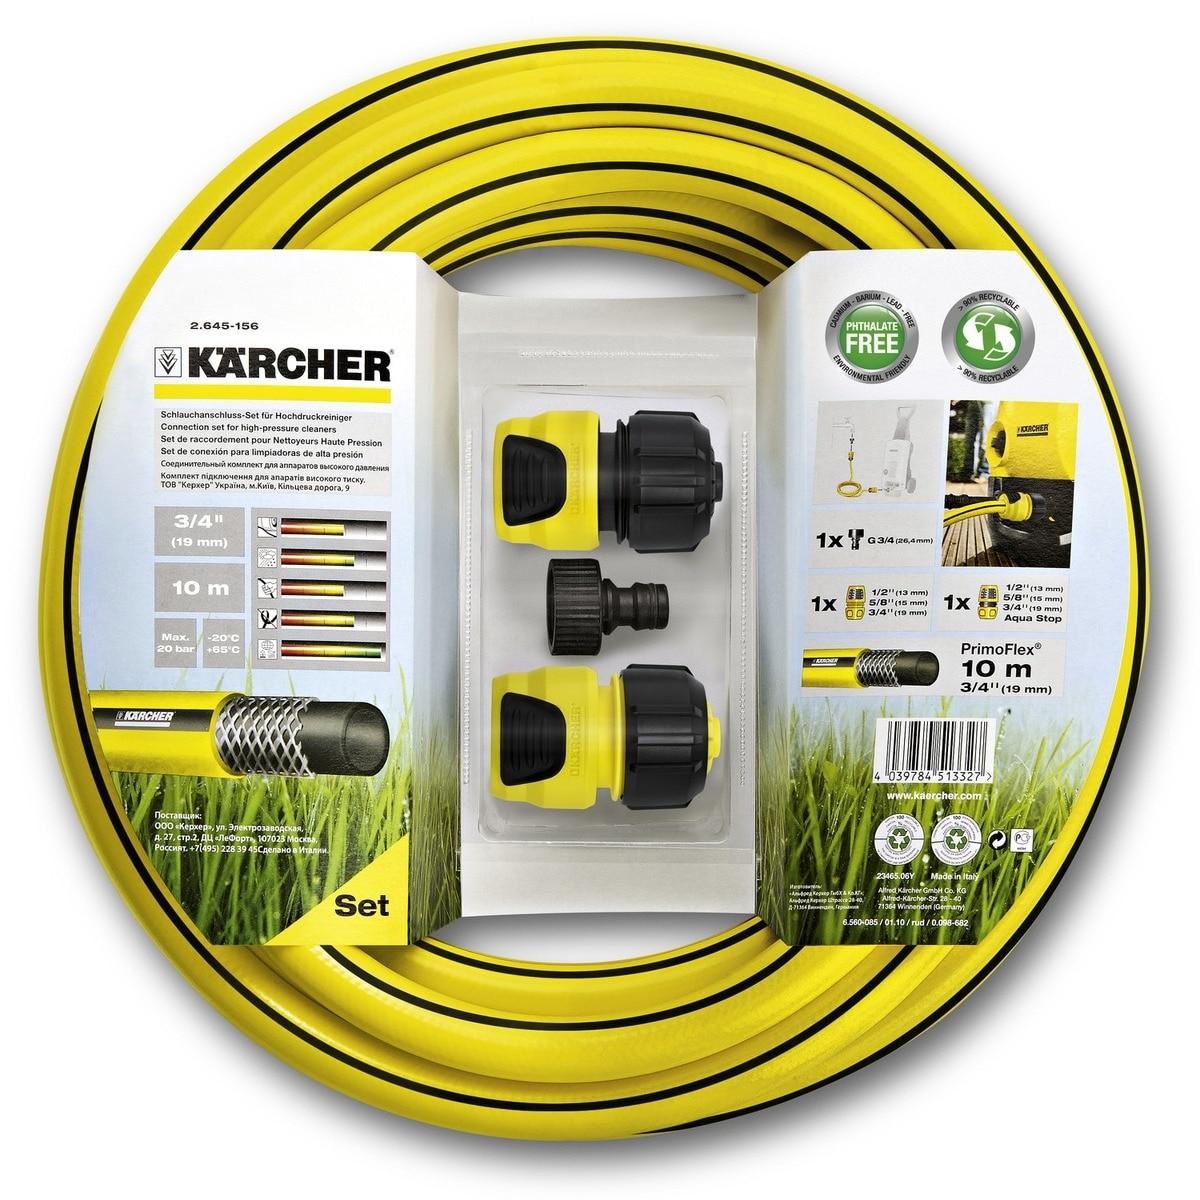 Reinforced hose KARCHER (2.645-156) (10 m length, diameter 19mm/3/4 inch suitable for high pressure apparatus))